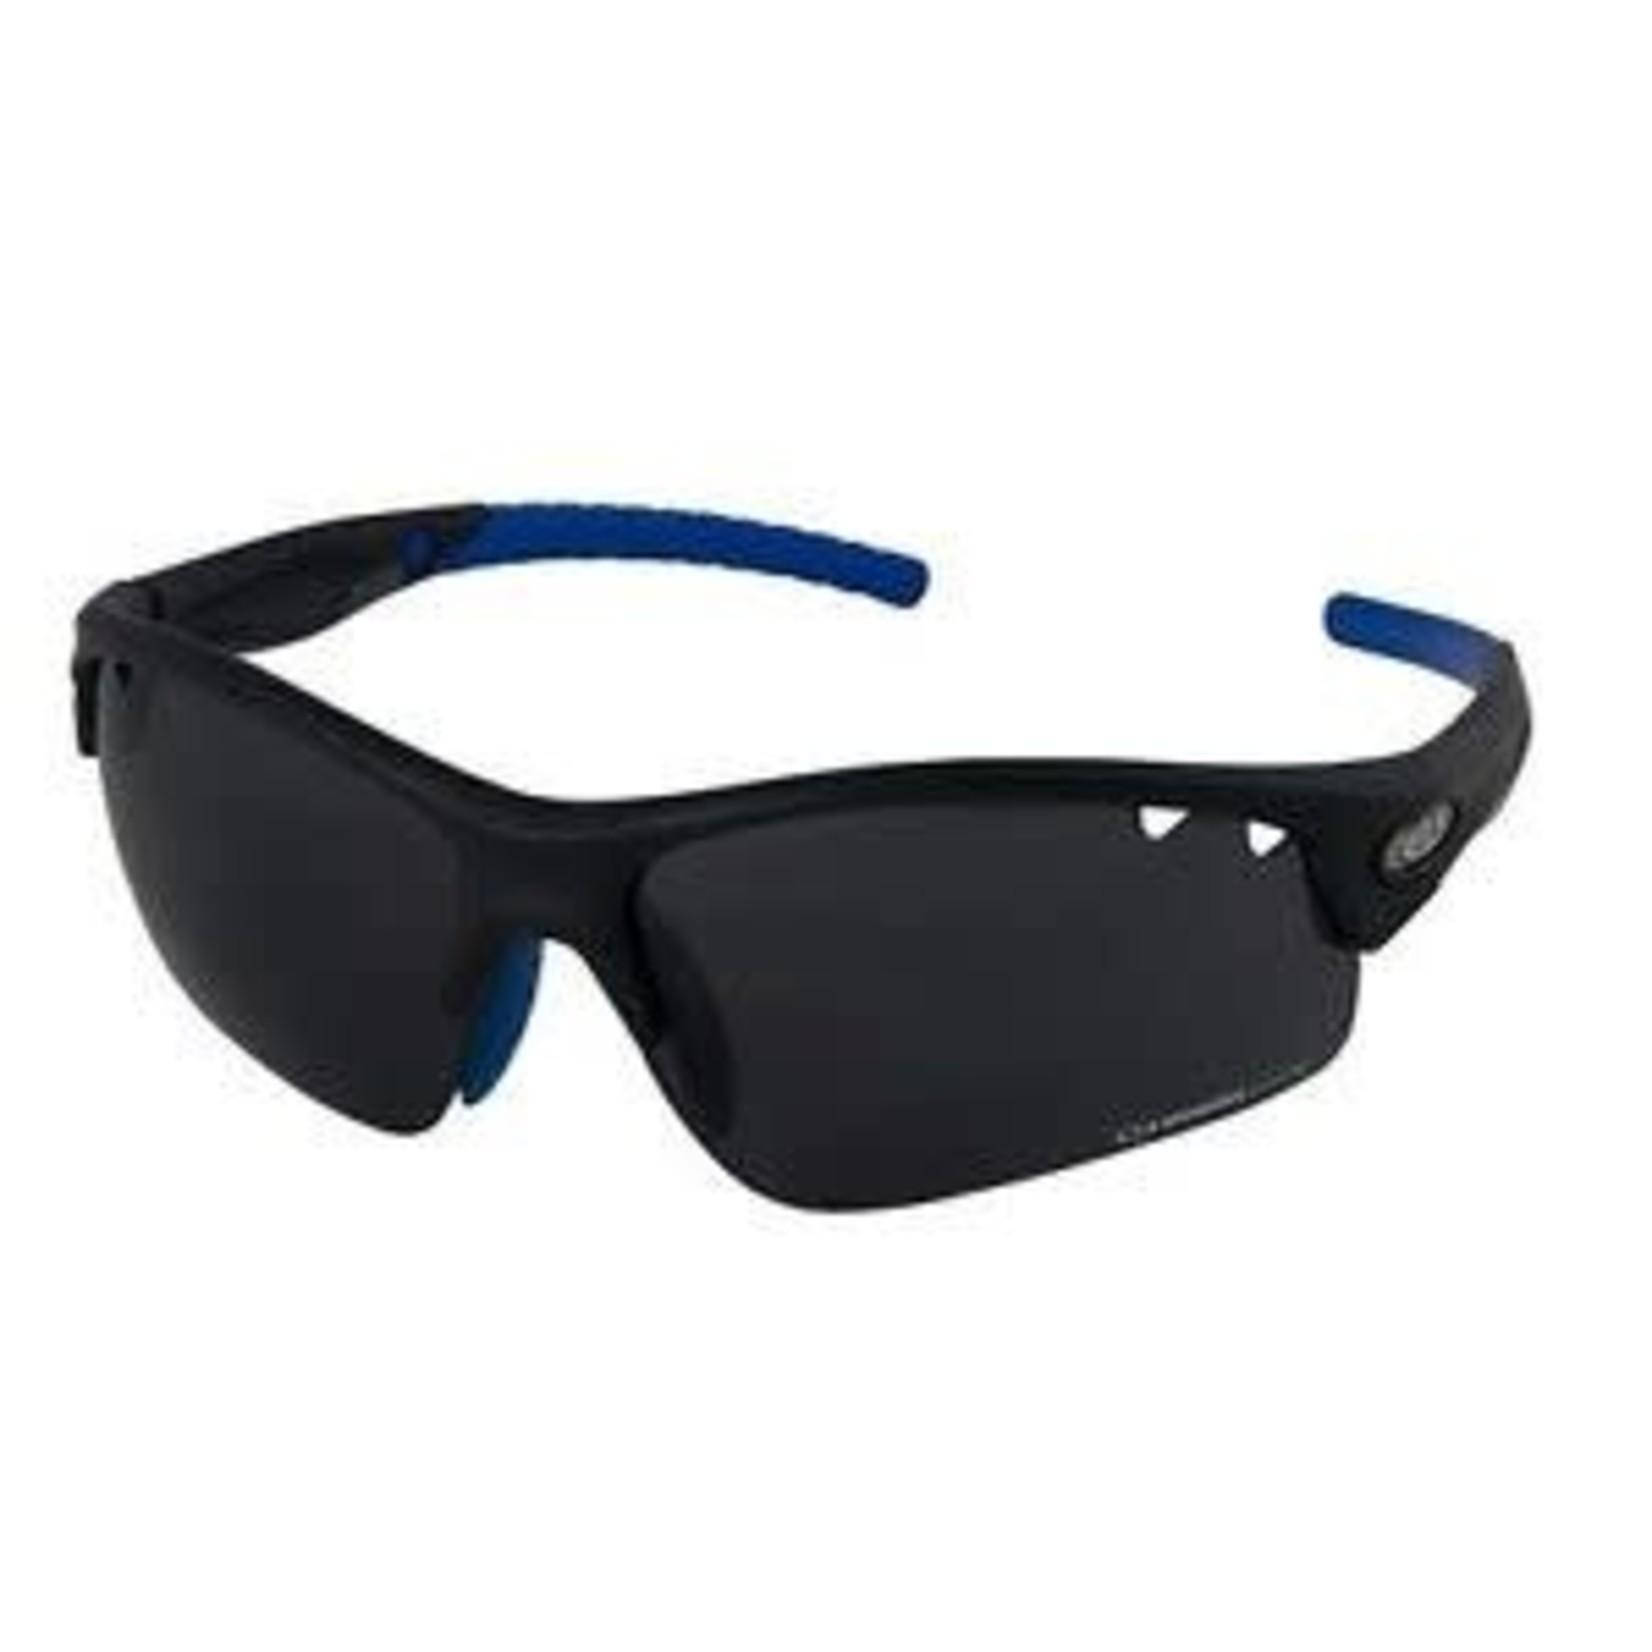 Ocean Sunglasses 39-110 Photo+1 Black/Blue